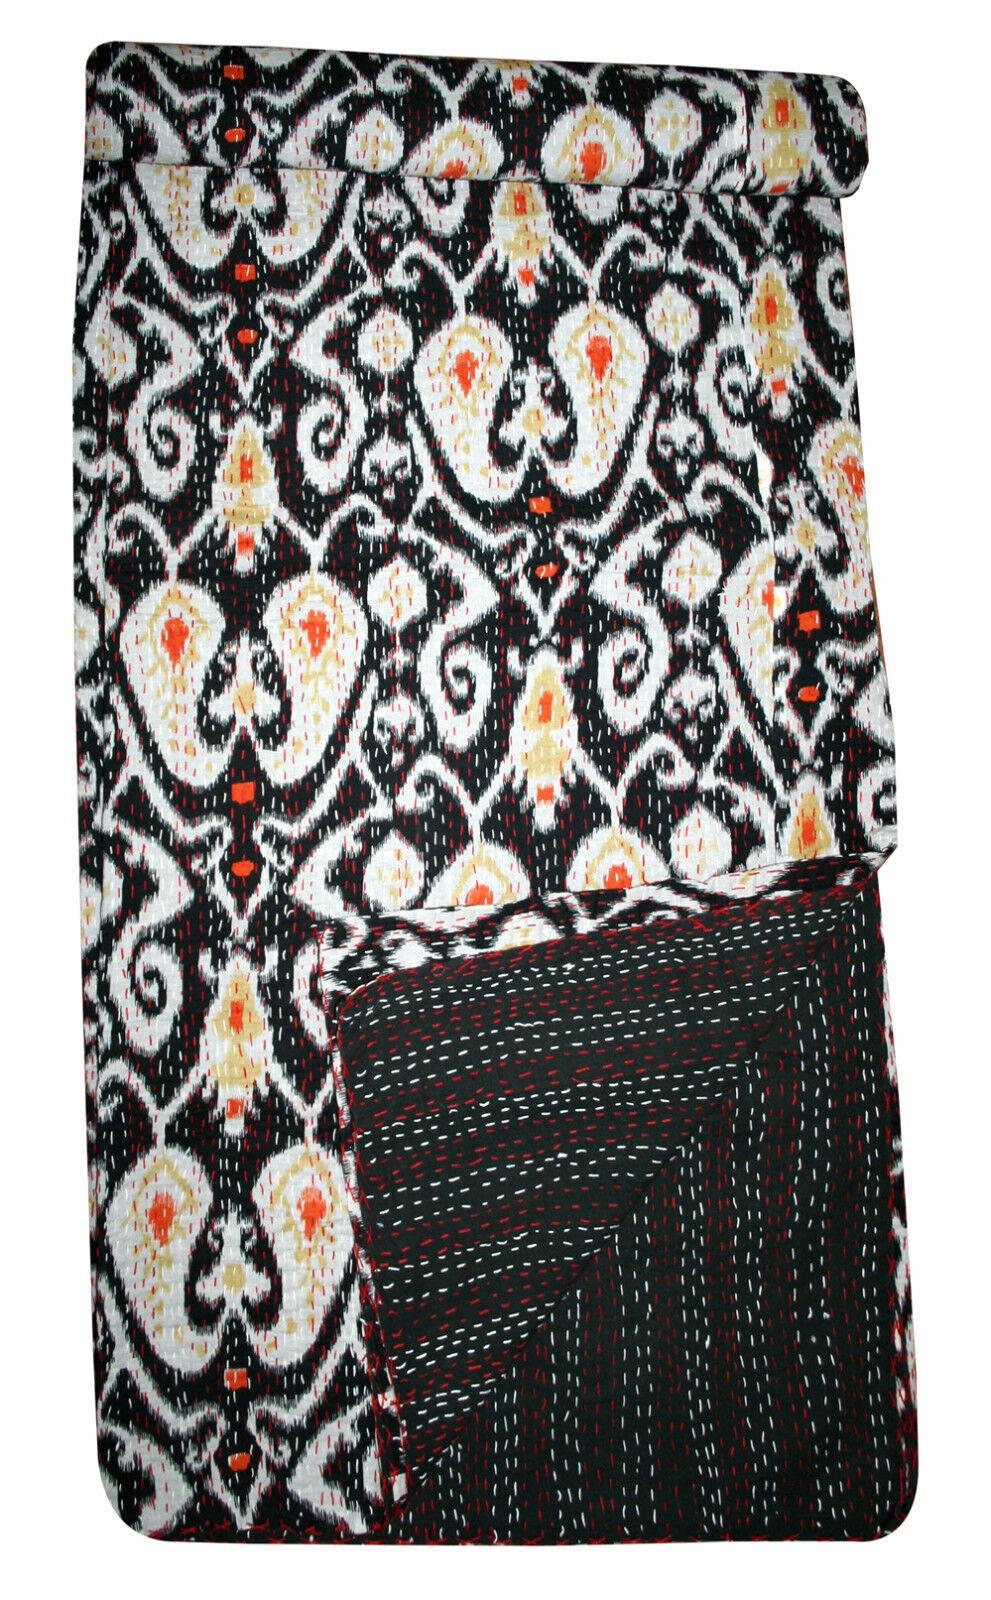 Ikat Paisley Print Kantha Quilted Bedspread Kantha Bedsheet kantha Bed cover